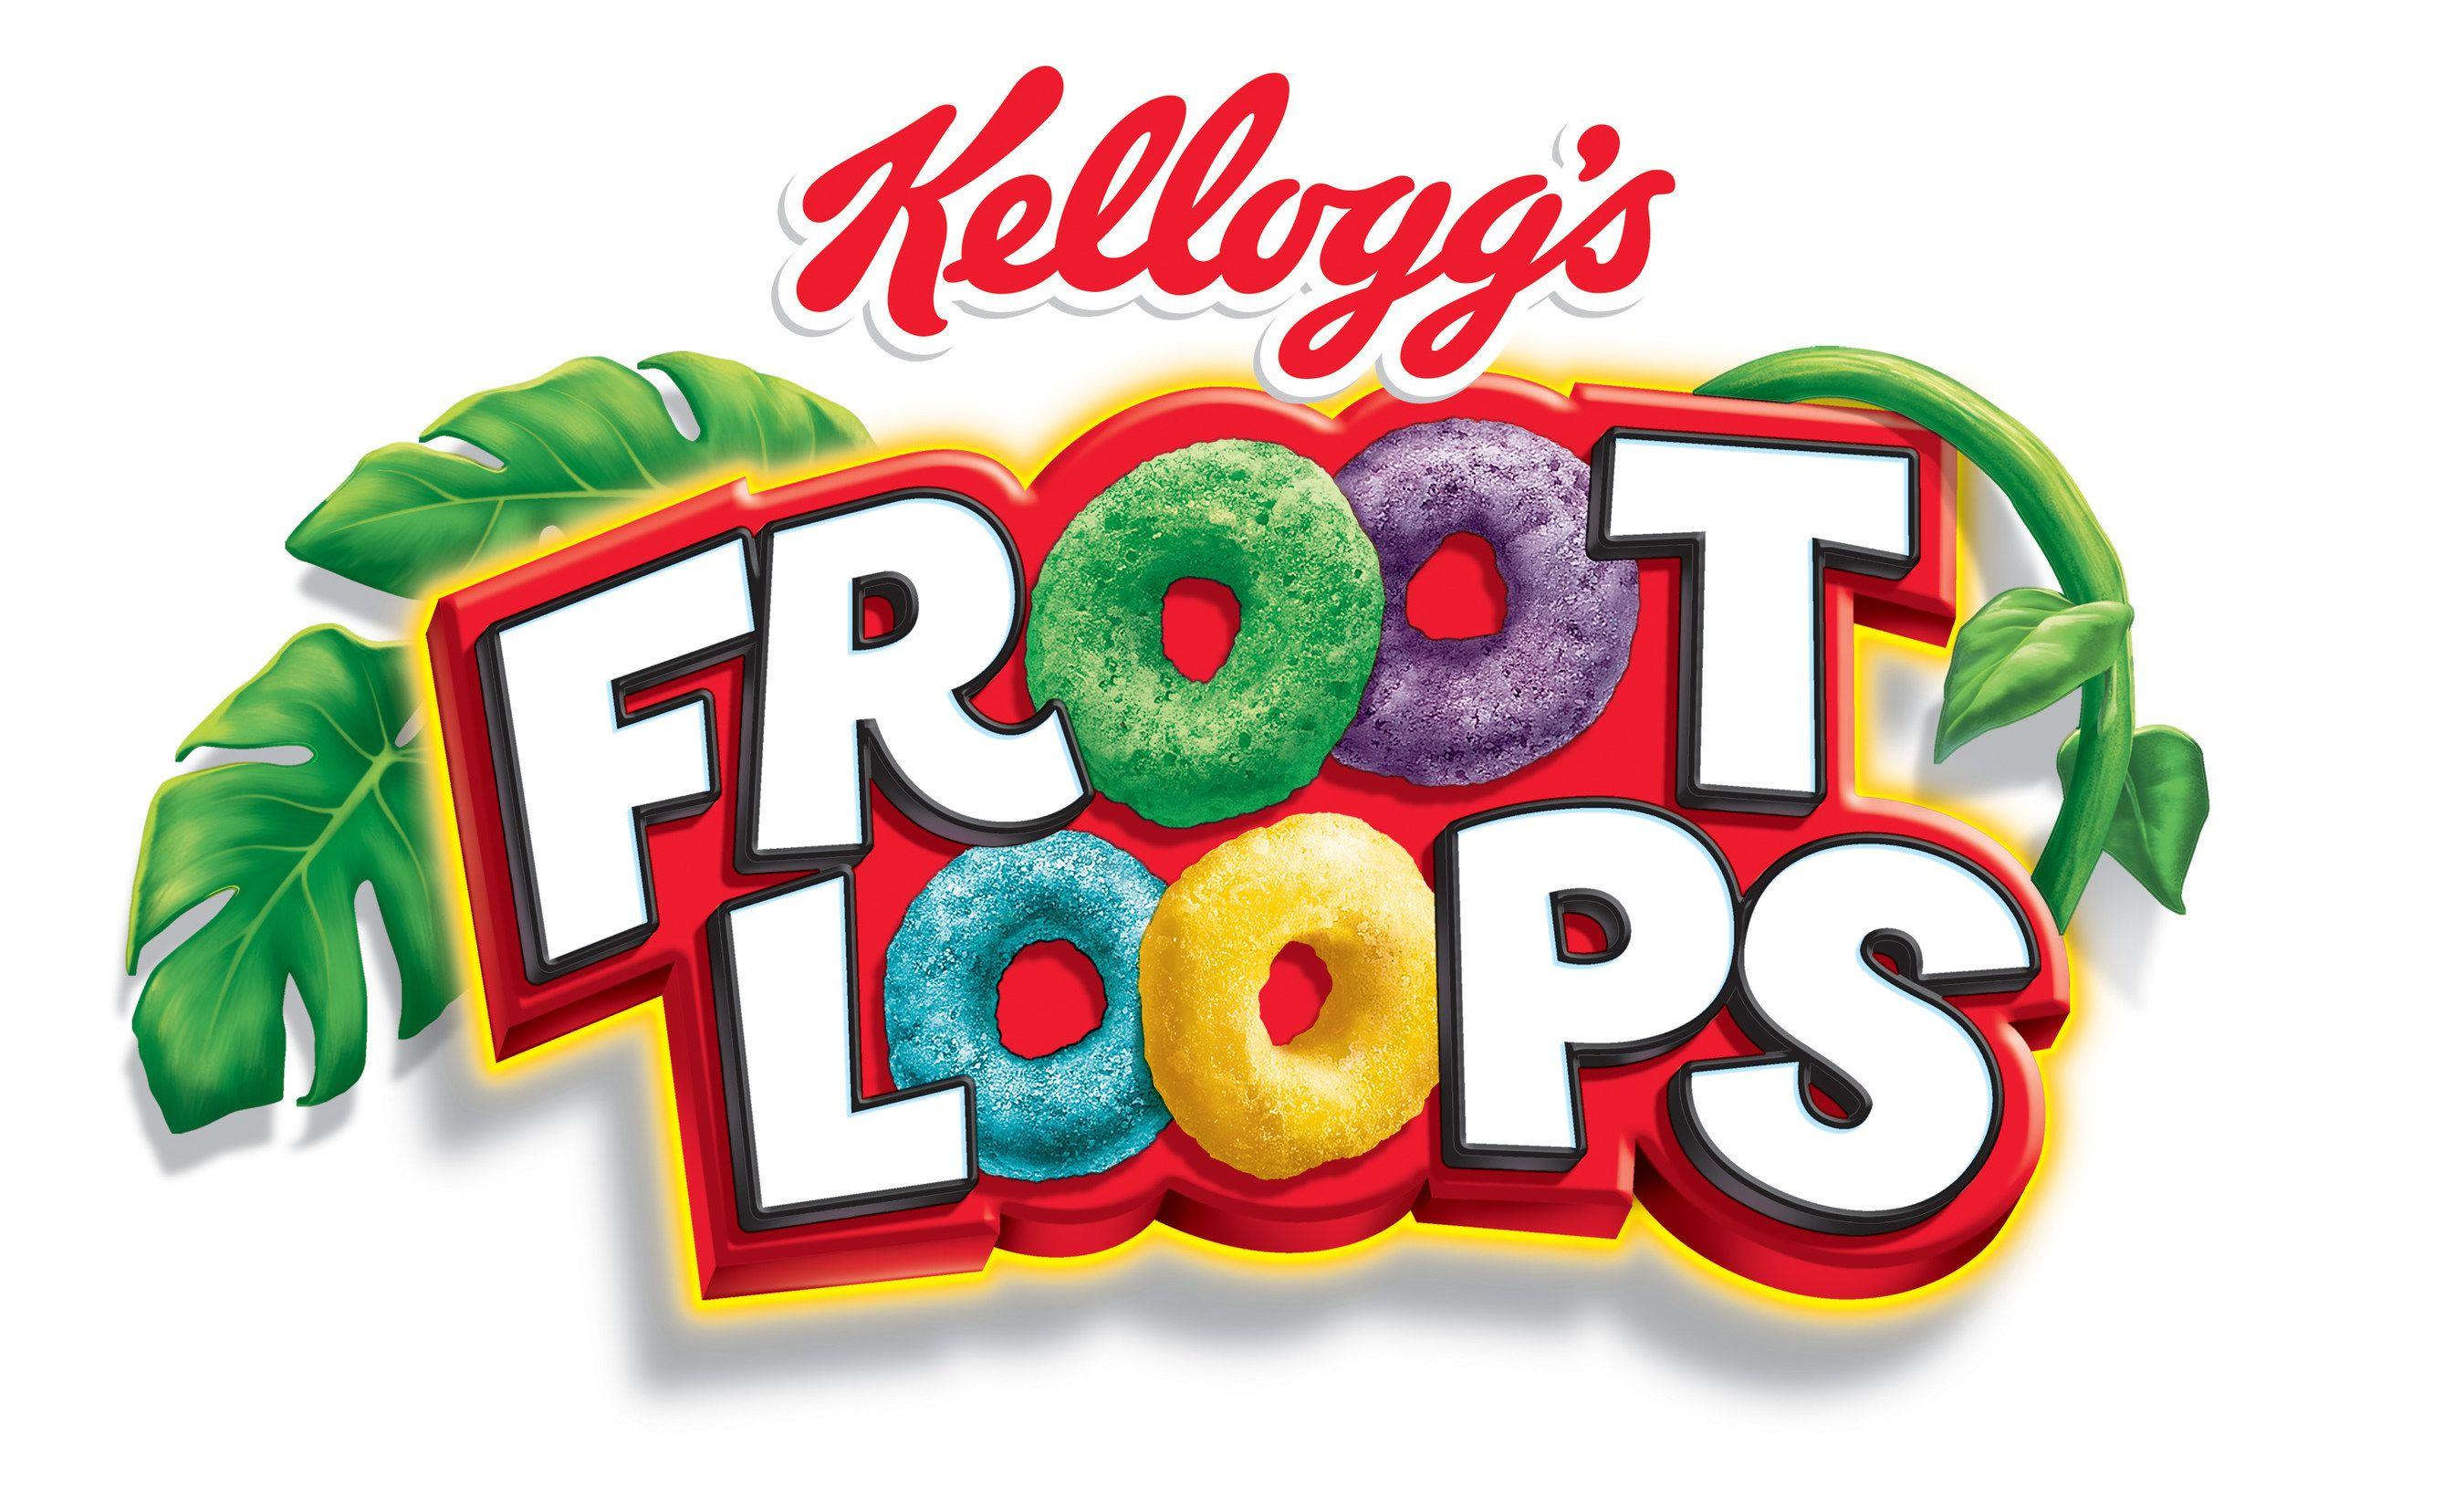 Kellogg S Froot Loops And Neff Serve Up Shades As Colorful As Froot Loops Kelloggs Kellogg Logo